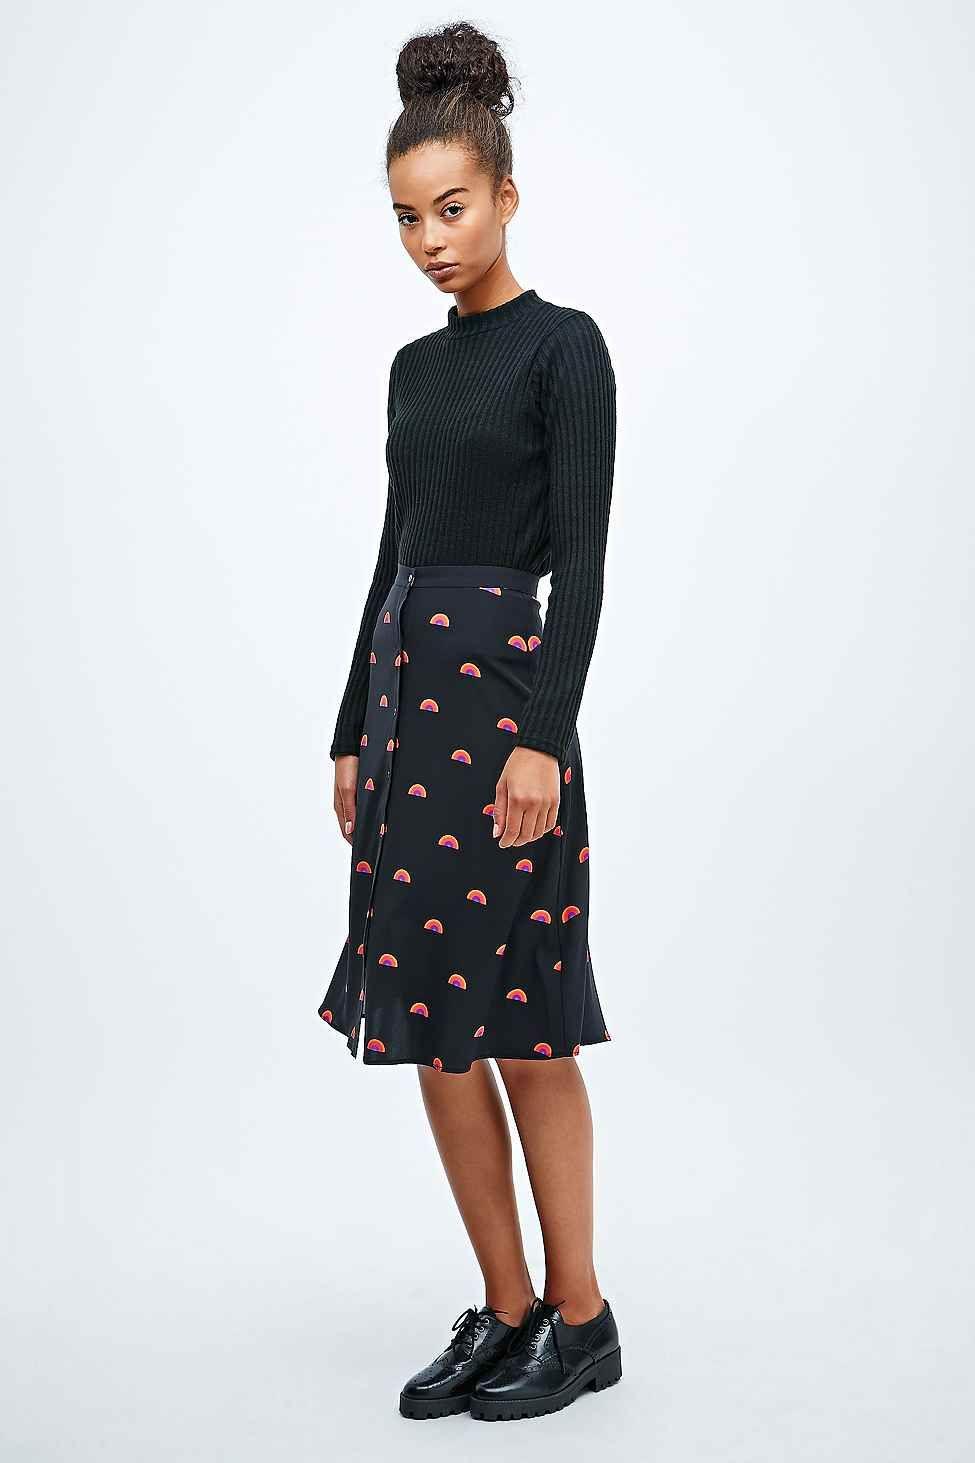 Lulu & Co Rainbow Print Midi Skirt in Black